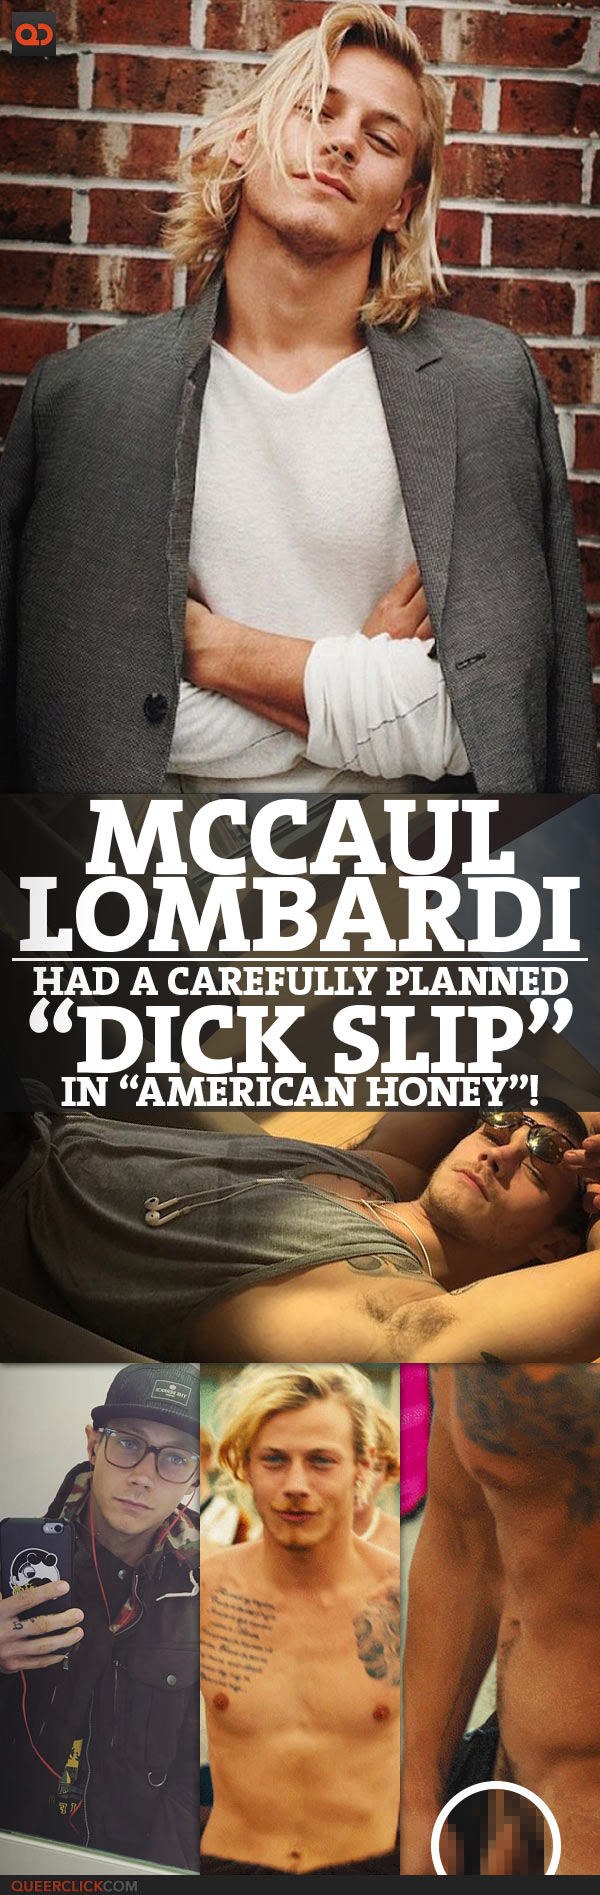 "McCaul Lombardi Had A Carefully Planned ""Dick Slip"" In ""American Honey""!"